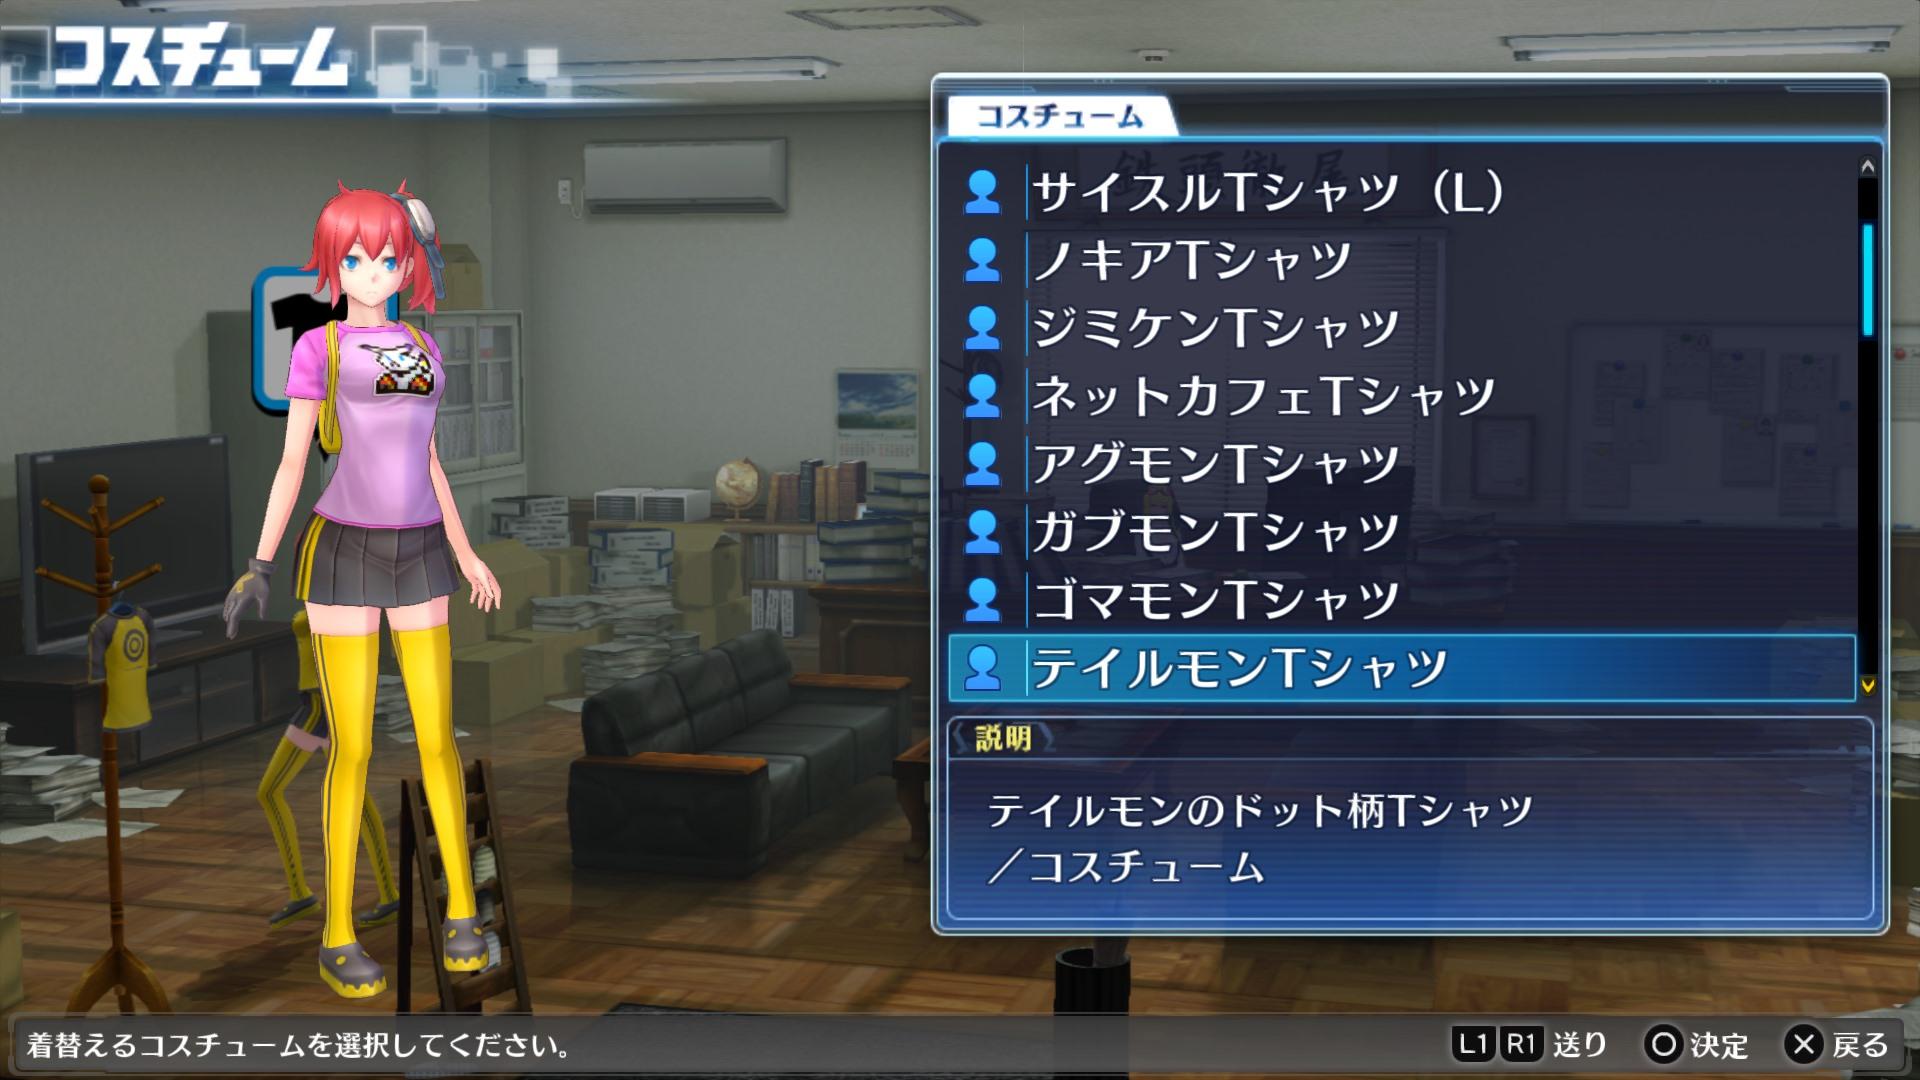 3rd-strike com | Digimon Story: Cyber Sleuth – Hacker's Memory